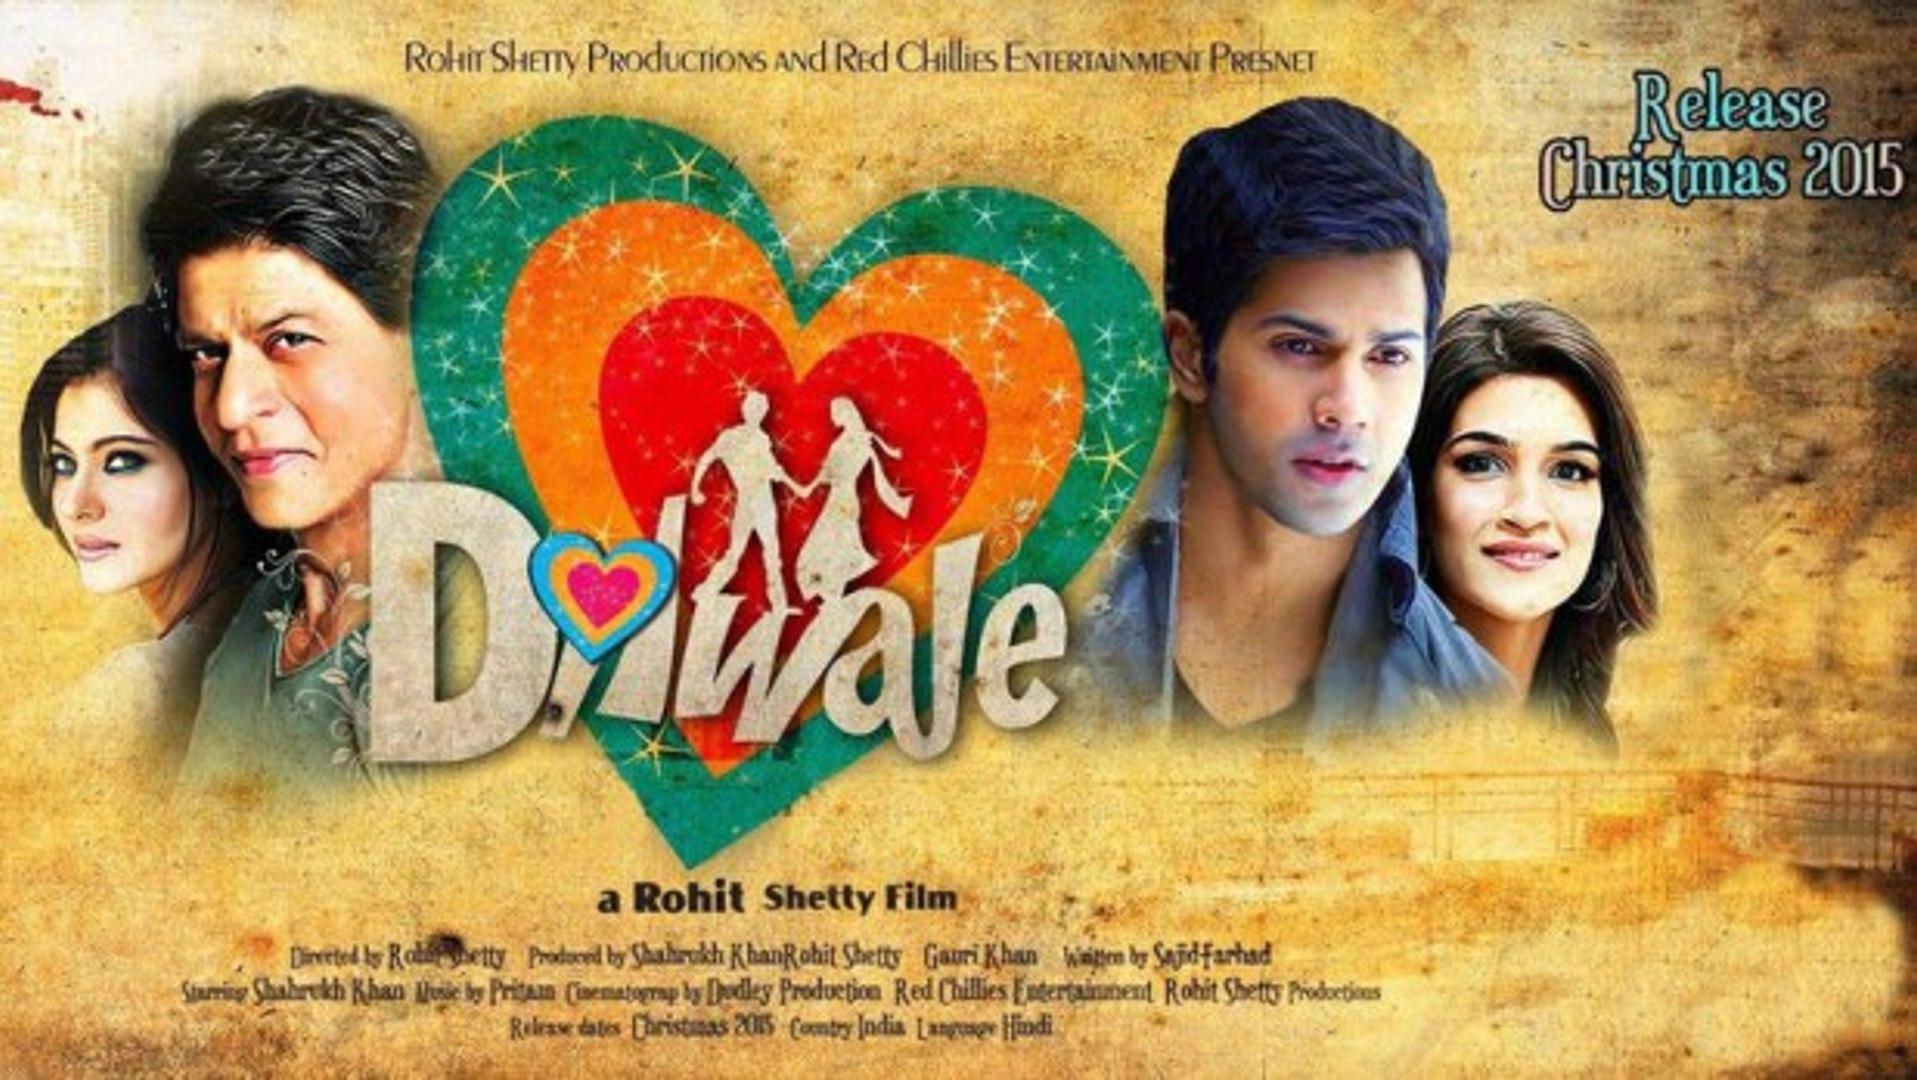 Dilwale (2015) Hindi Movie Celebrate Video HD 720p